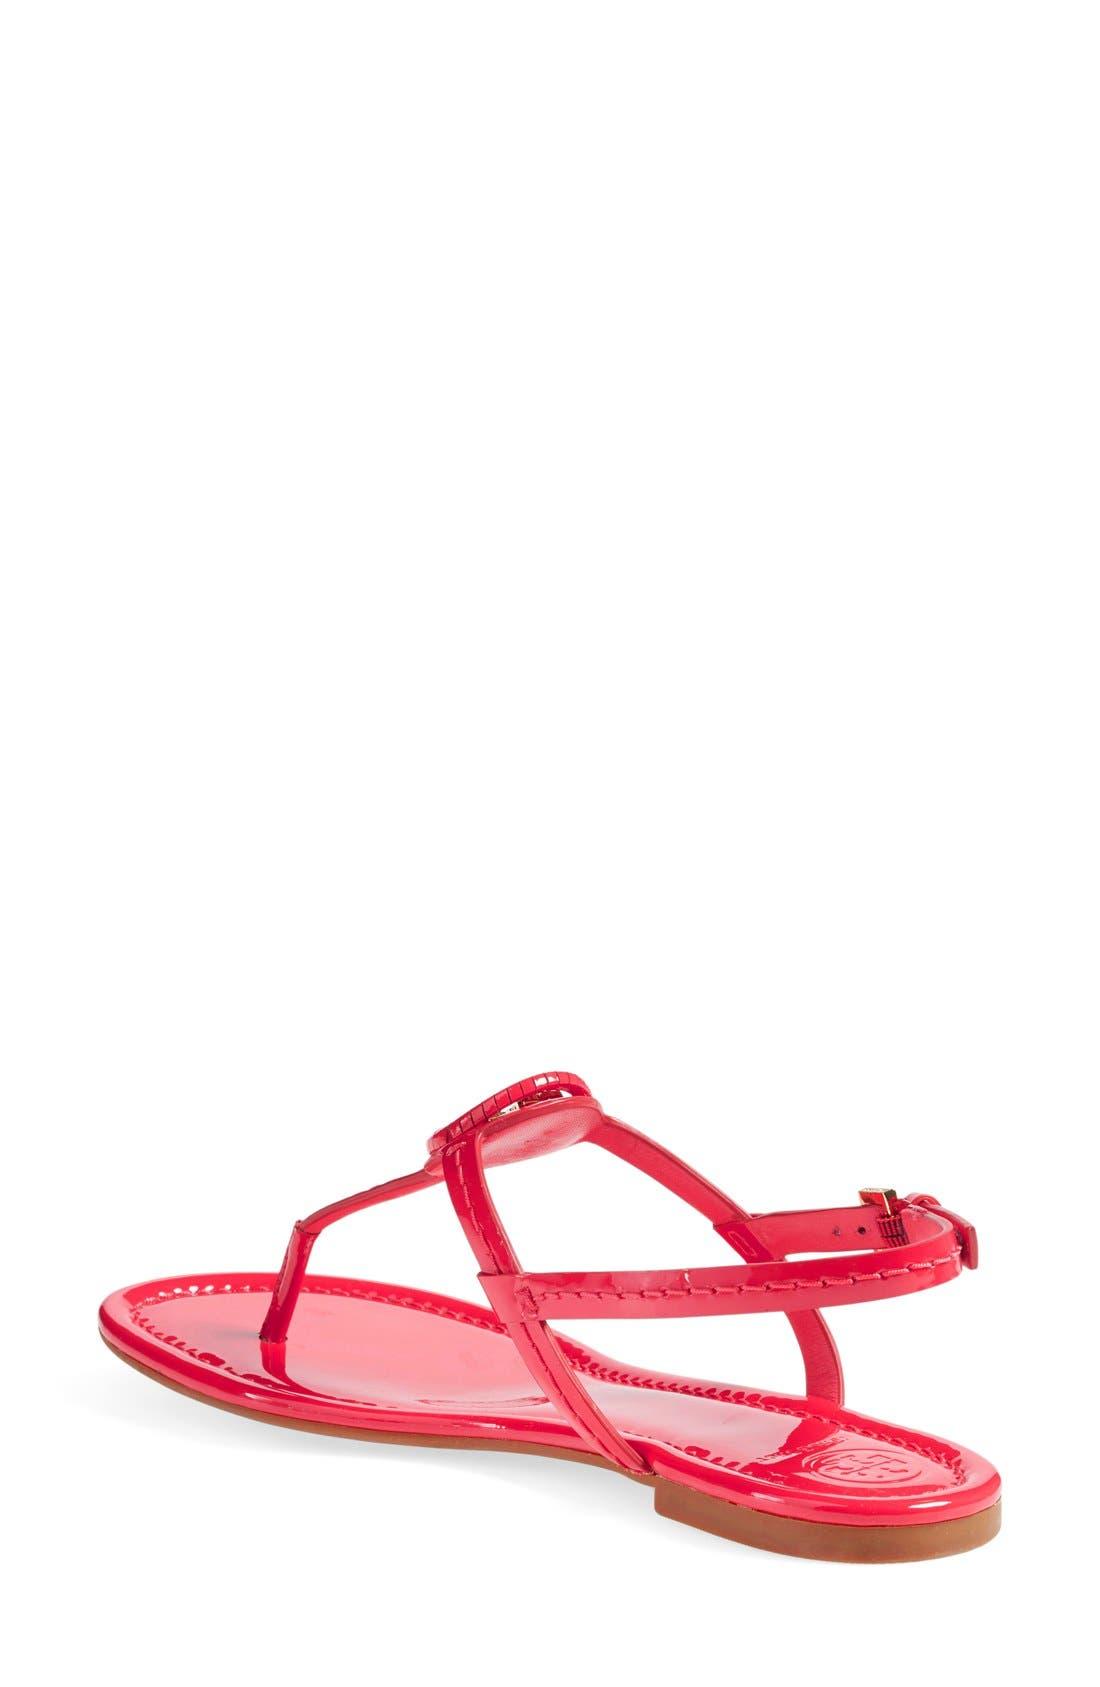 Alternate Image 2  - Tory Burch 'Dillan' Sandal (Women) (Nordstrom Exclusive)